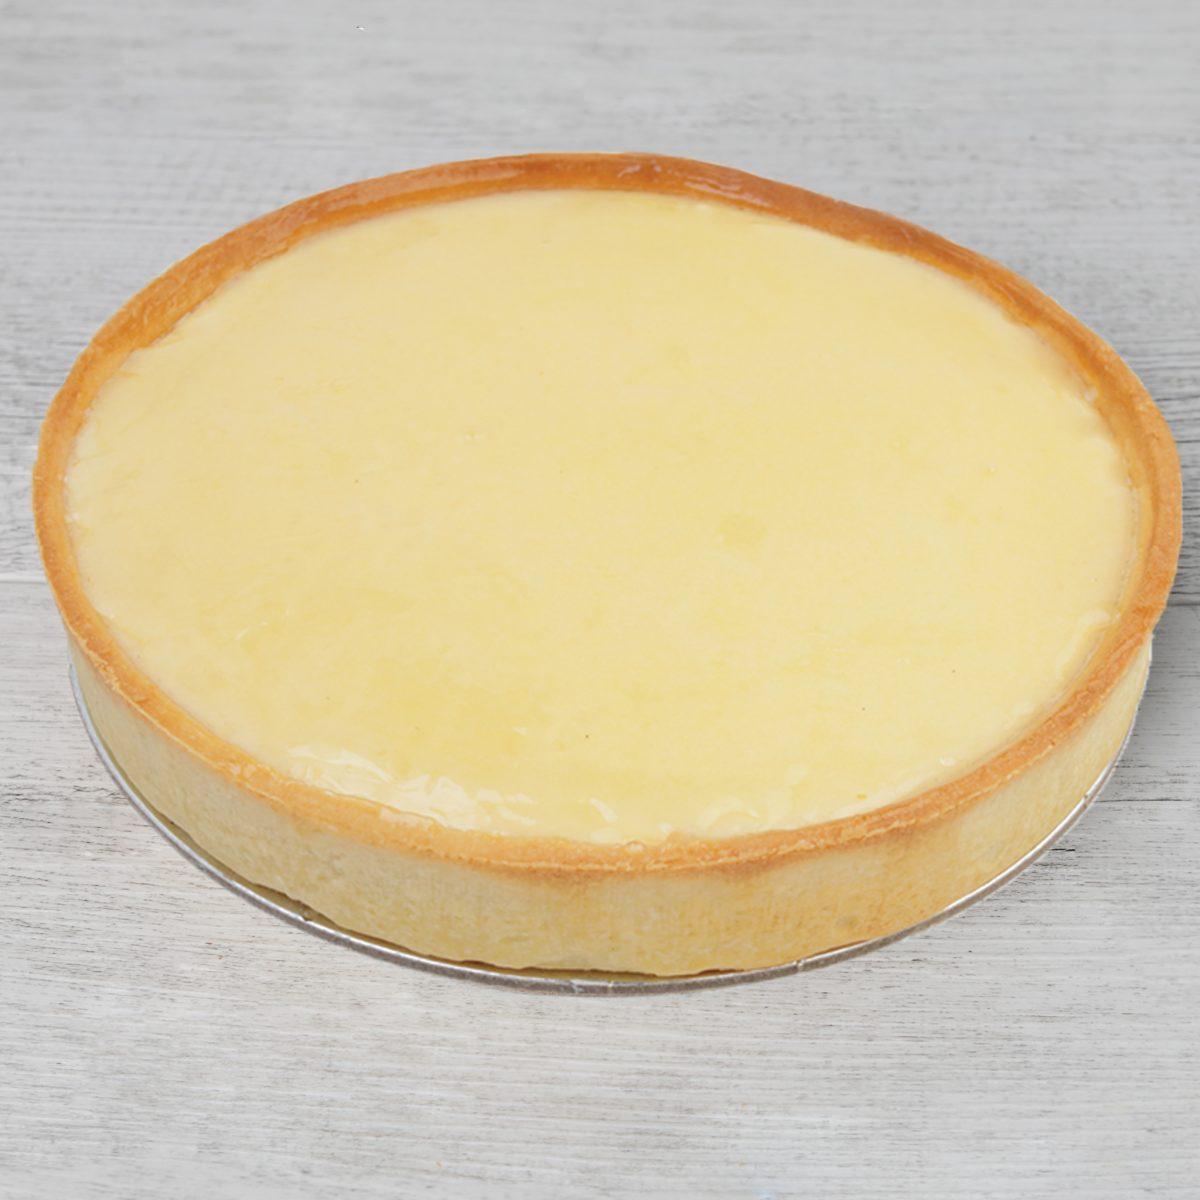 Baked Cheesecake Tart